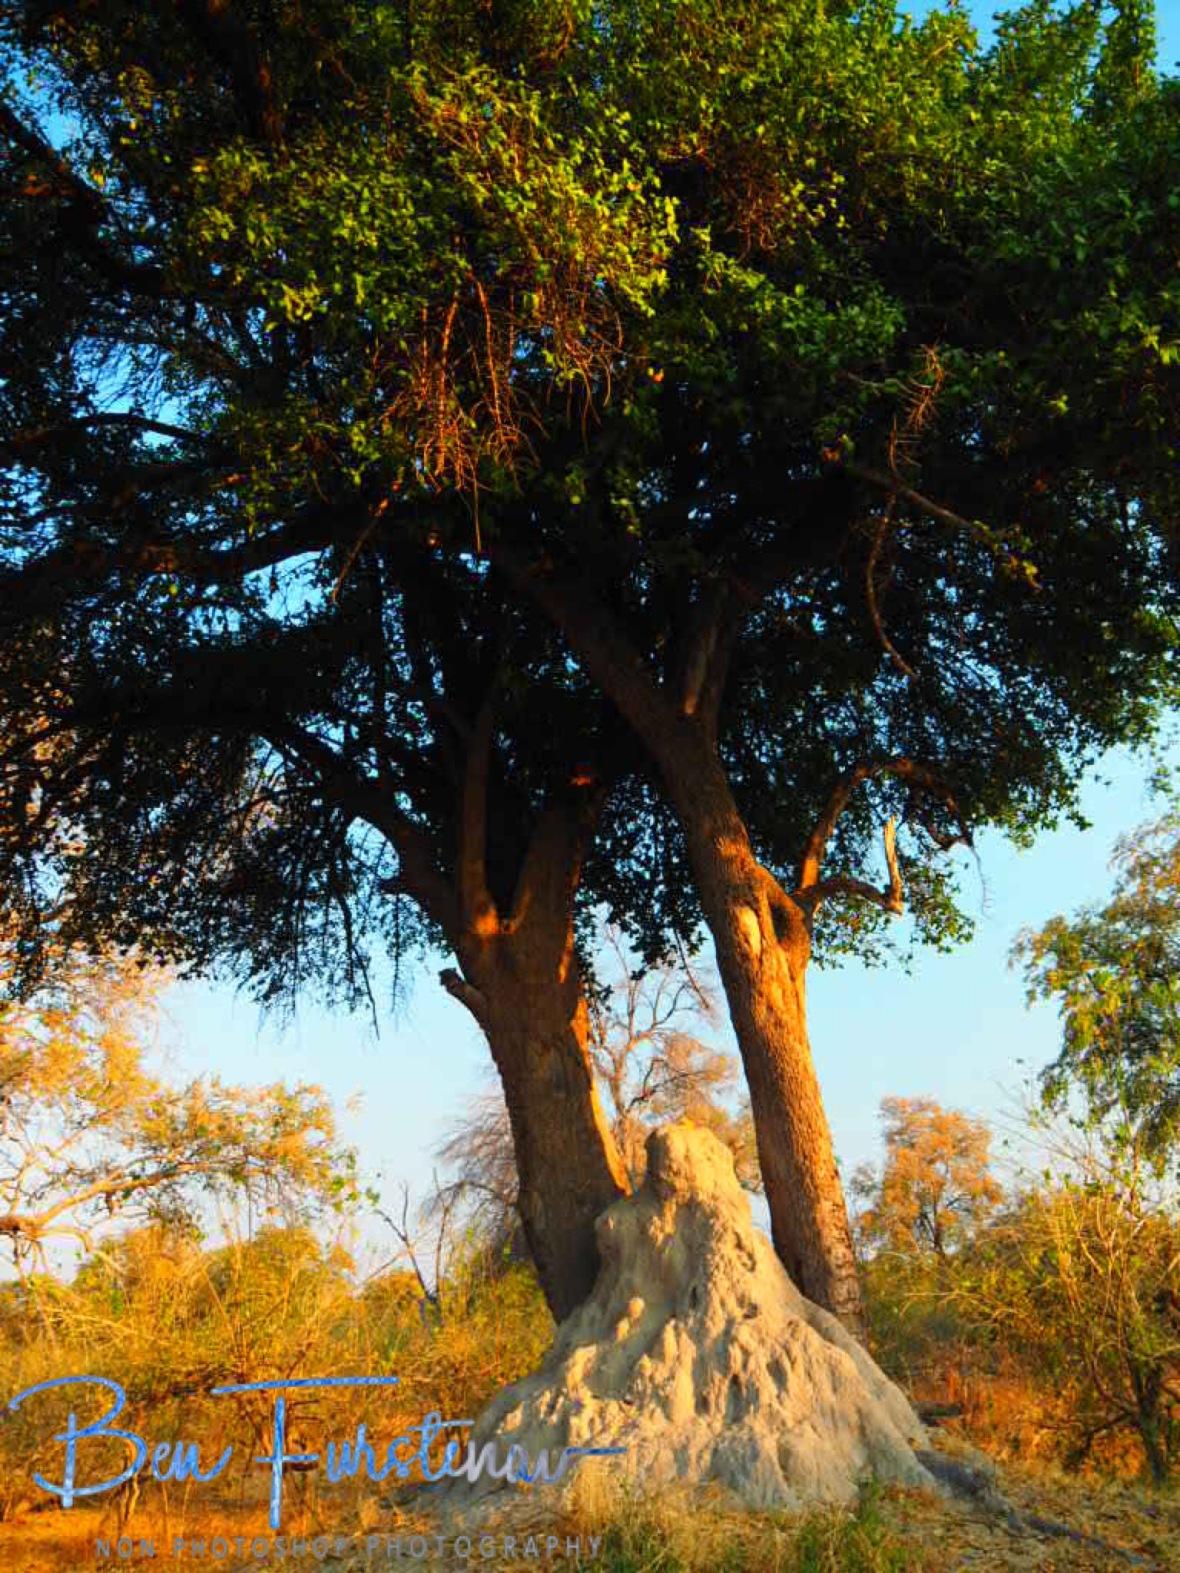 Termite occupied trees, Okavango Delta, Chobe National Park, Botswana